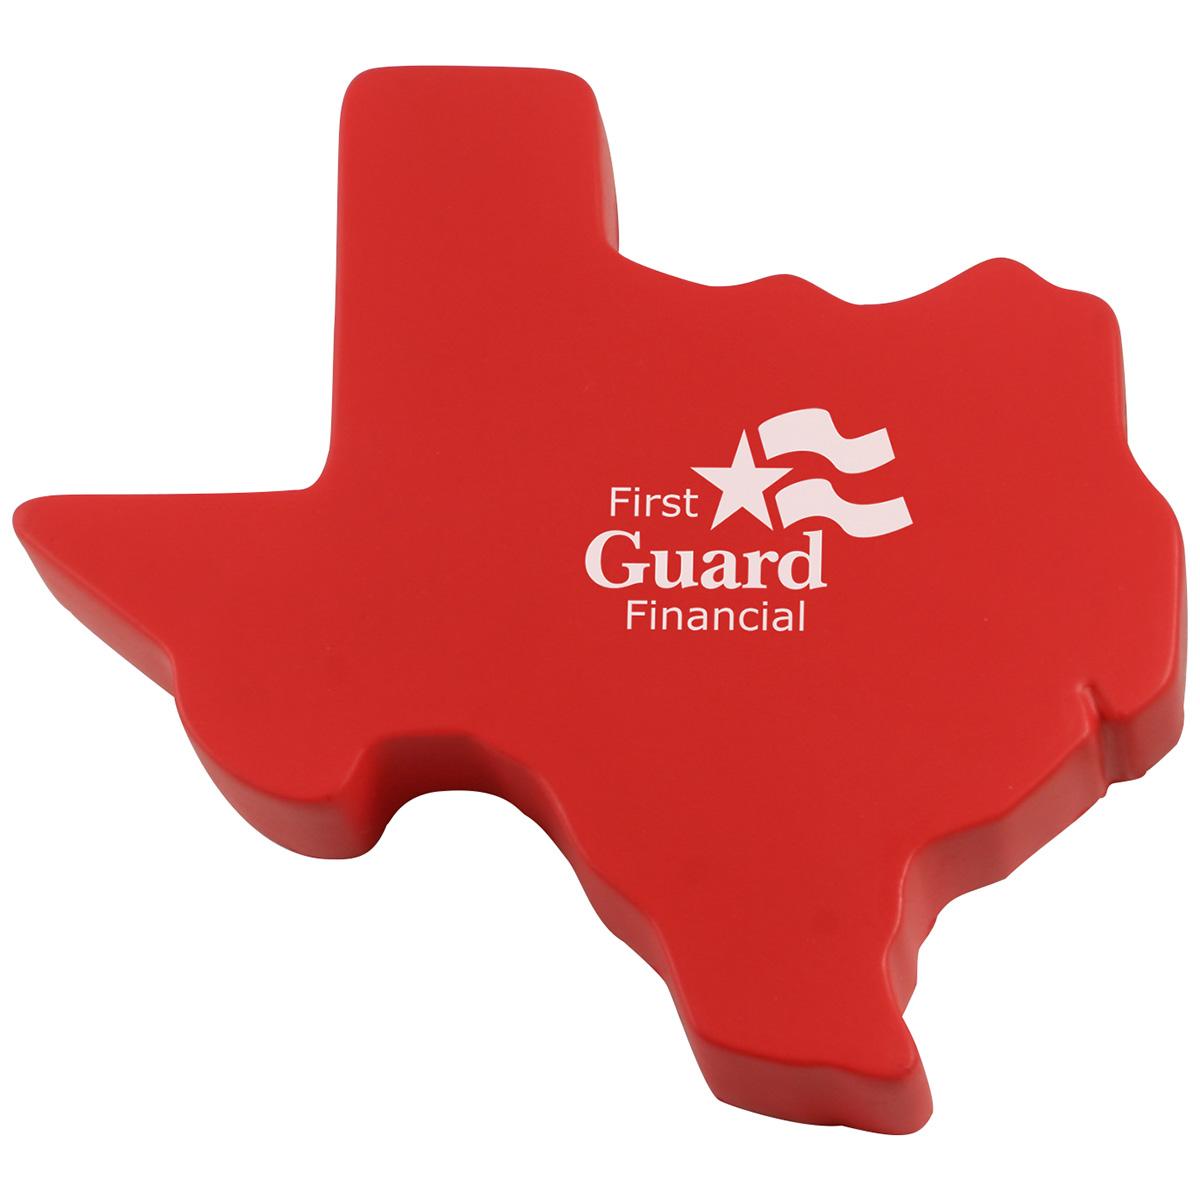 Texas Shape Stress Reliever, LTV-TX22 - 1 Colour Imprint